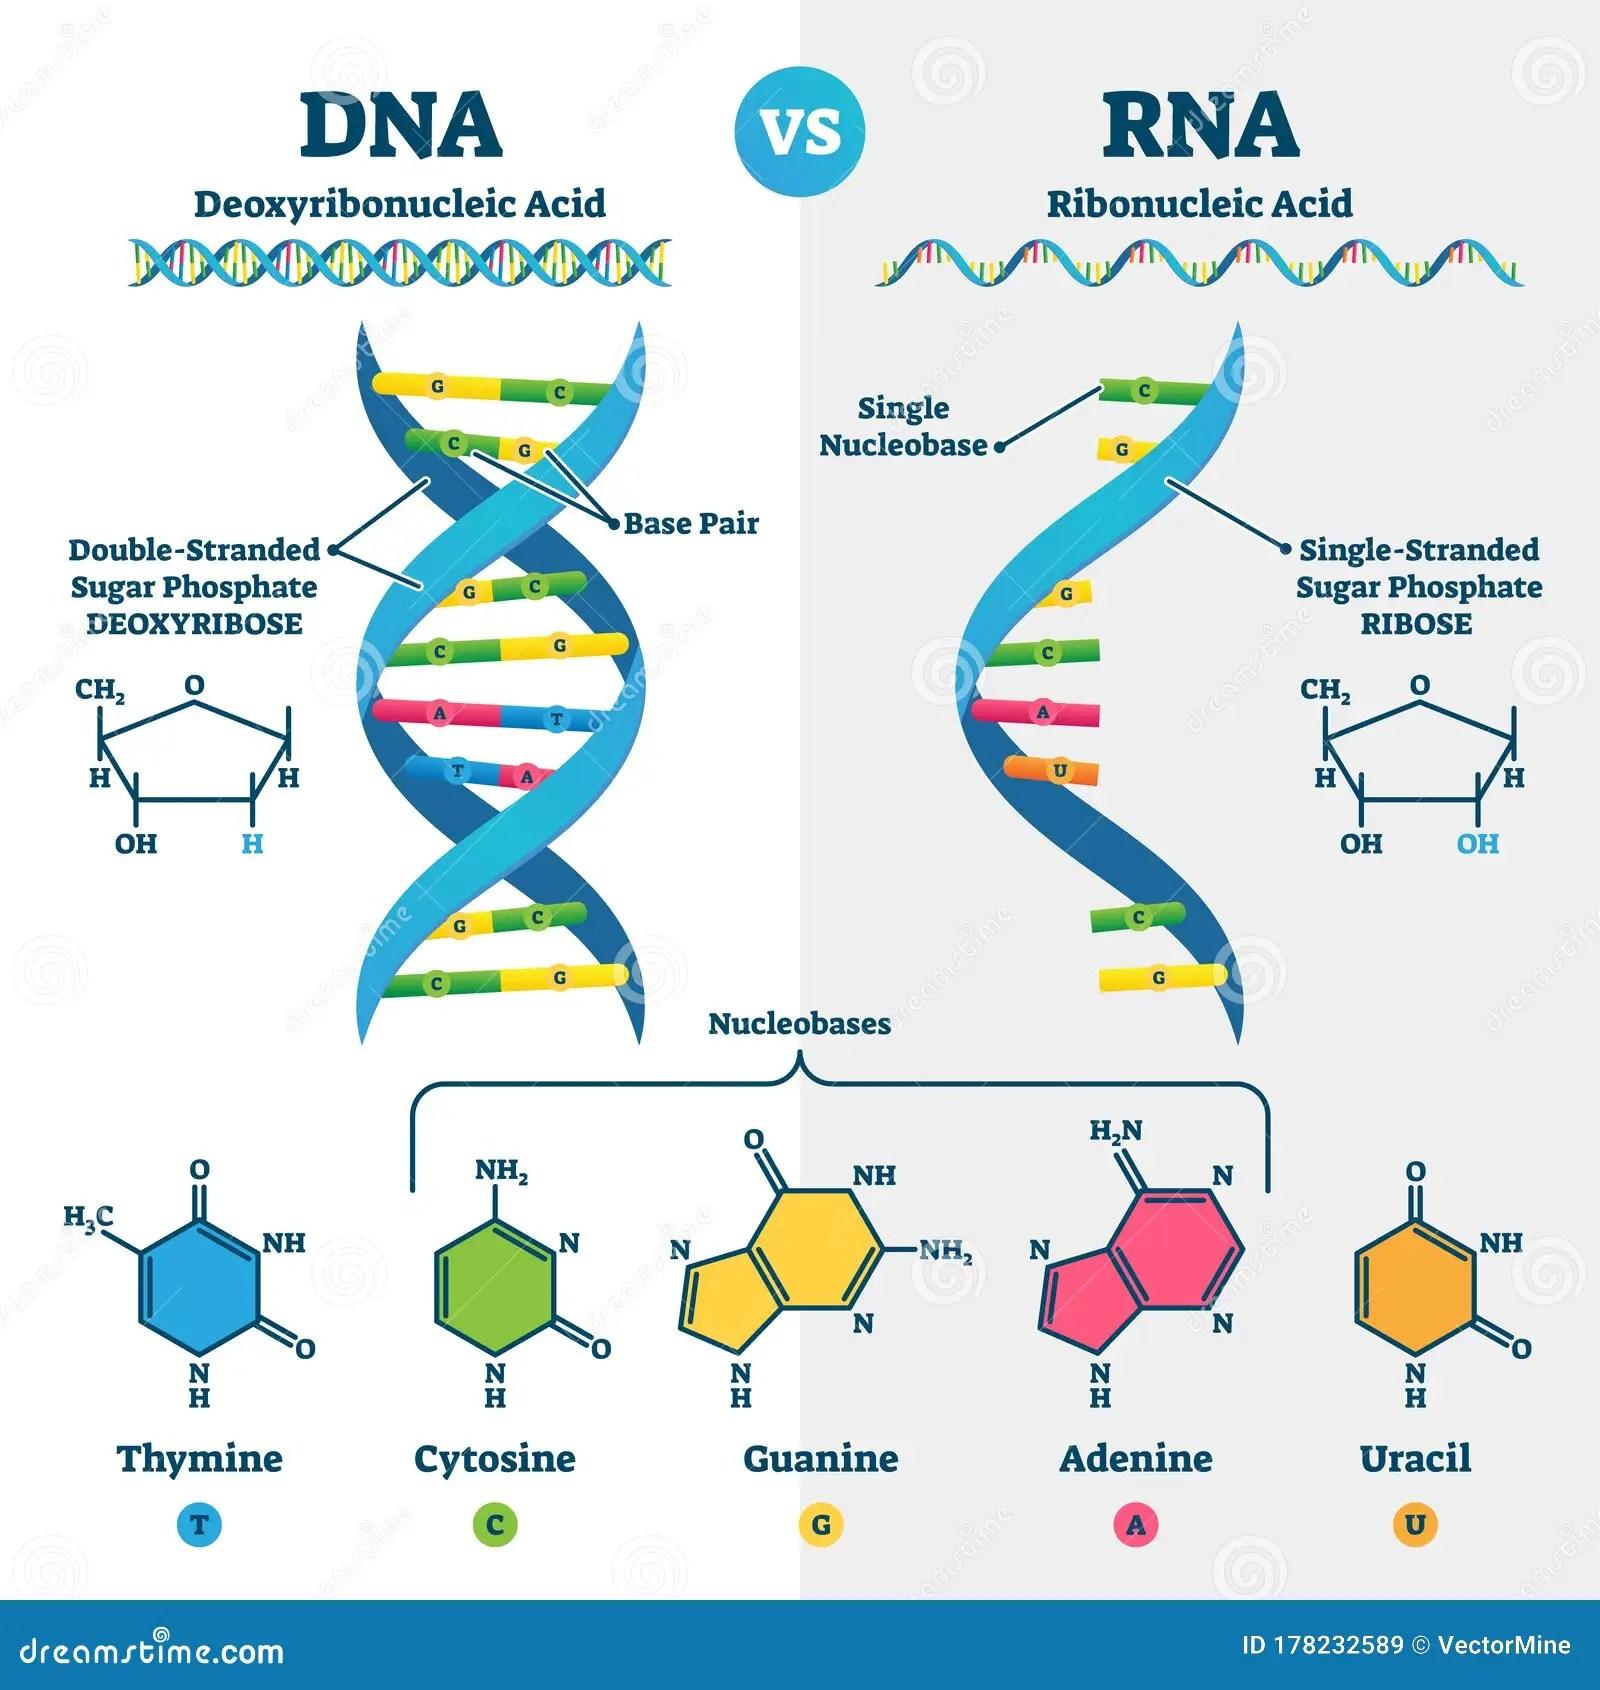 Dna Vs Rna Vector Illustration Educational Genetic Acid